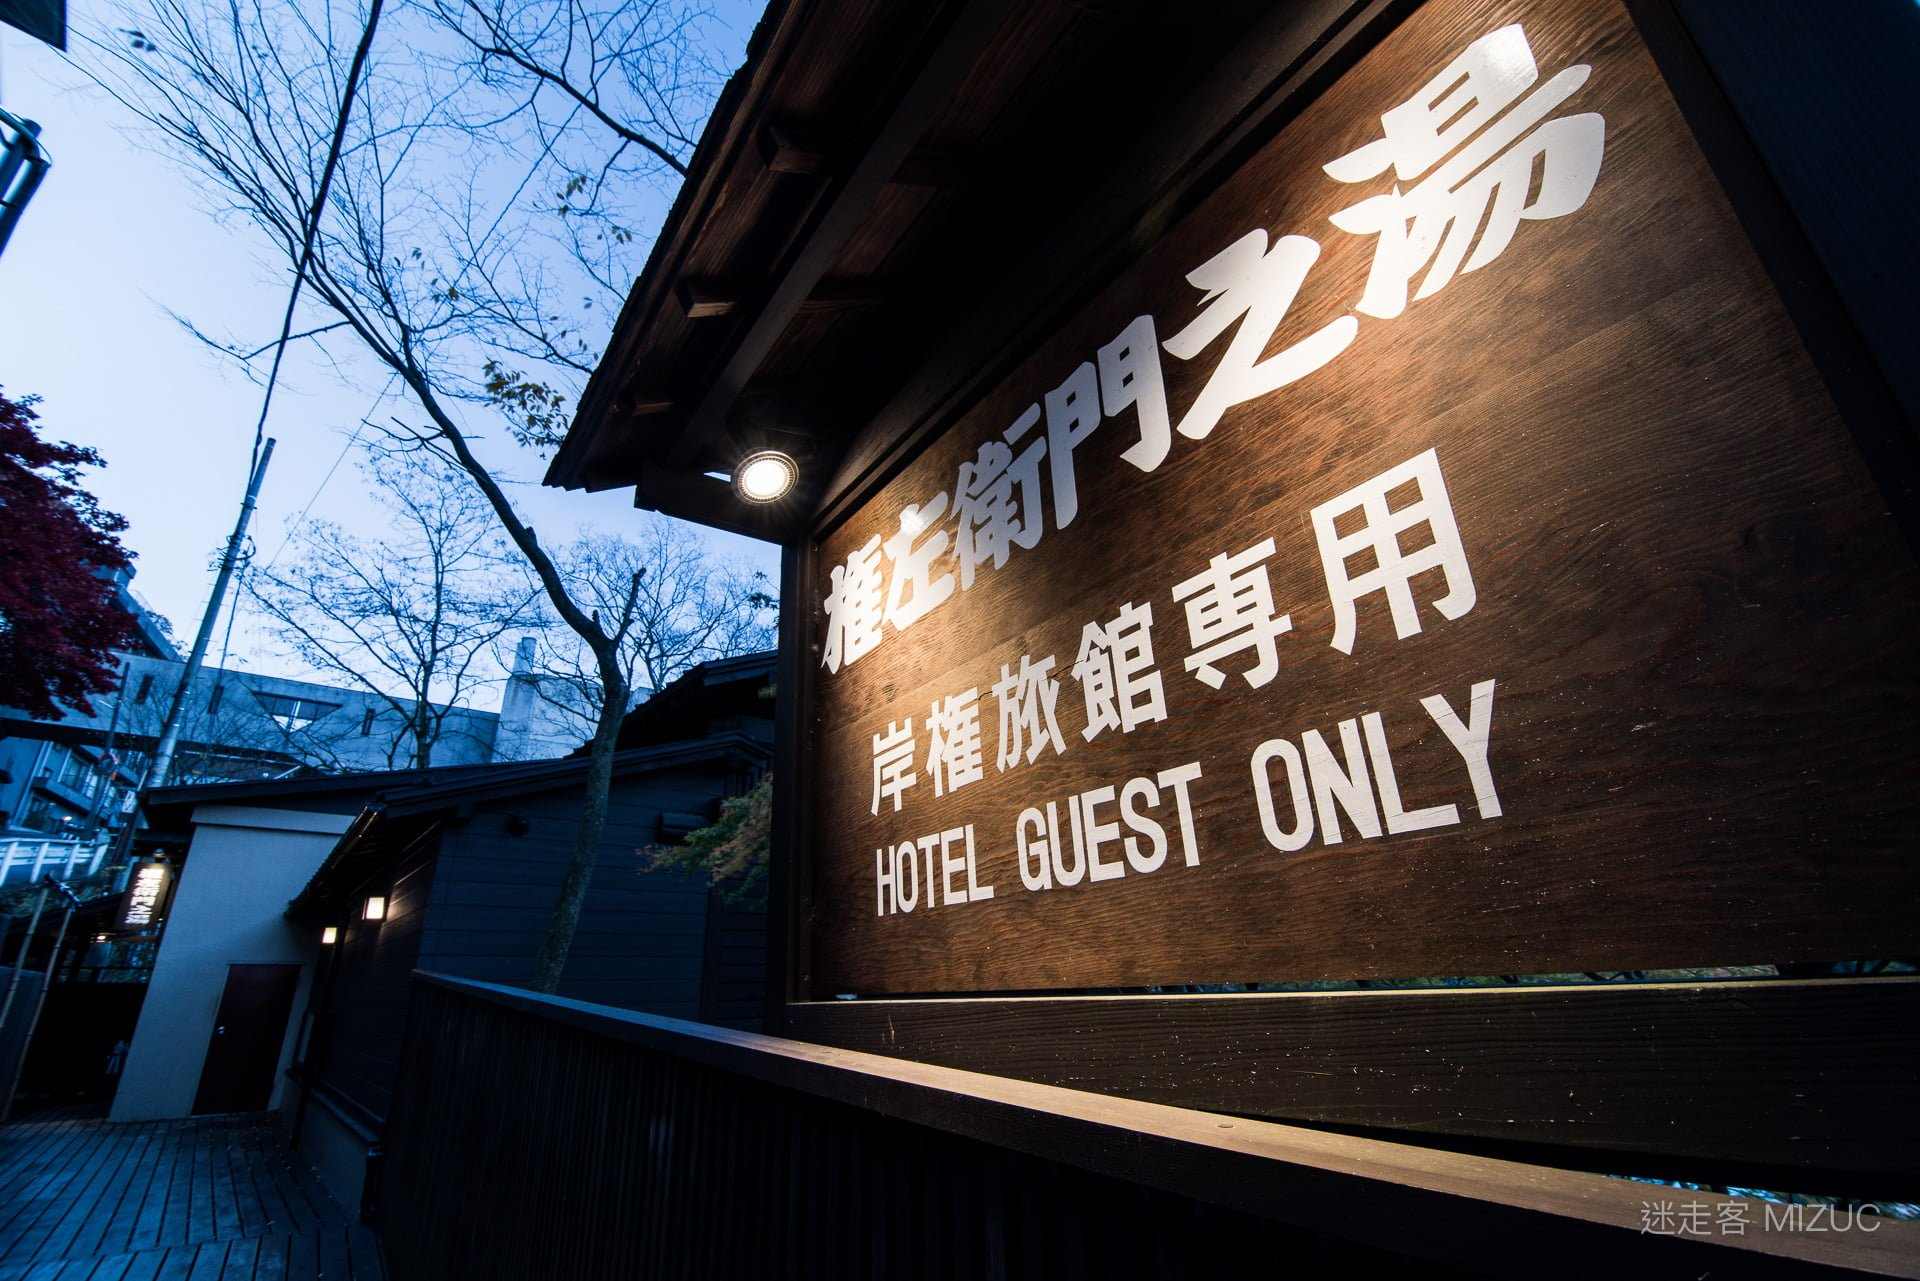 201711 Ibaraki Tochigi Gunma Japan Travel By RentalCar 71 日本自駕旅遊/北關東三縣「茨城、櫪木、群馬」秋天美食、溫泉與瀑布秘境百景(精選照片分享)